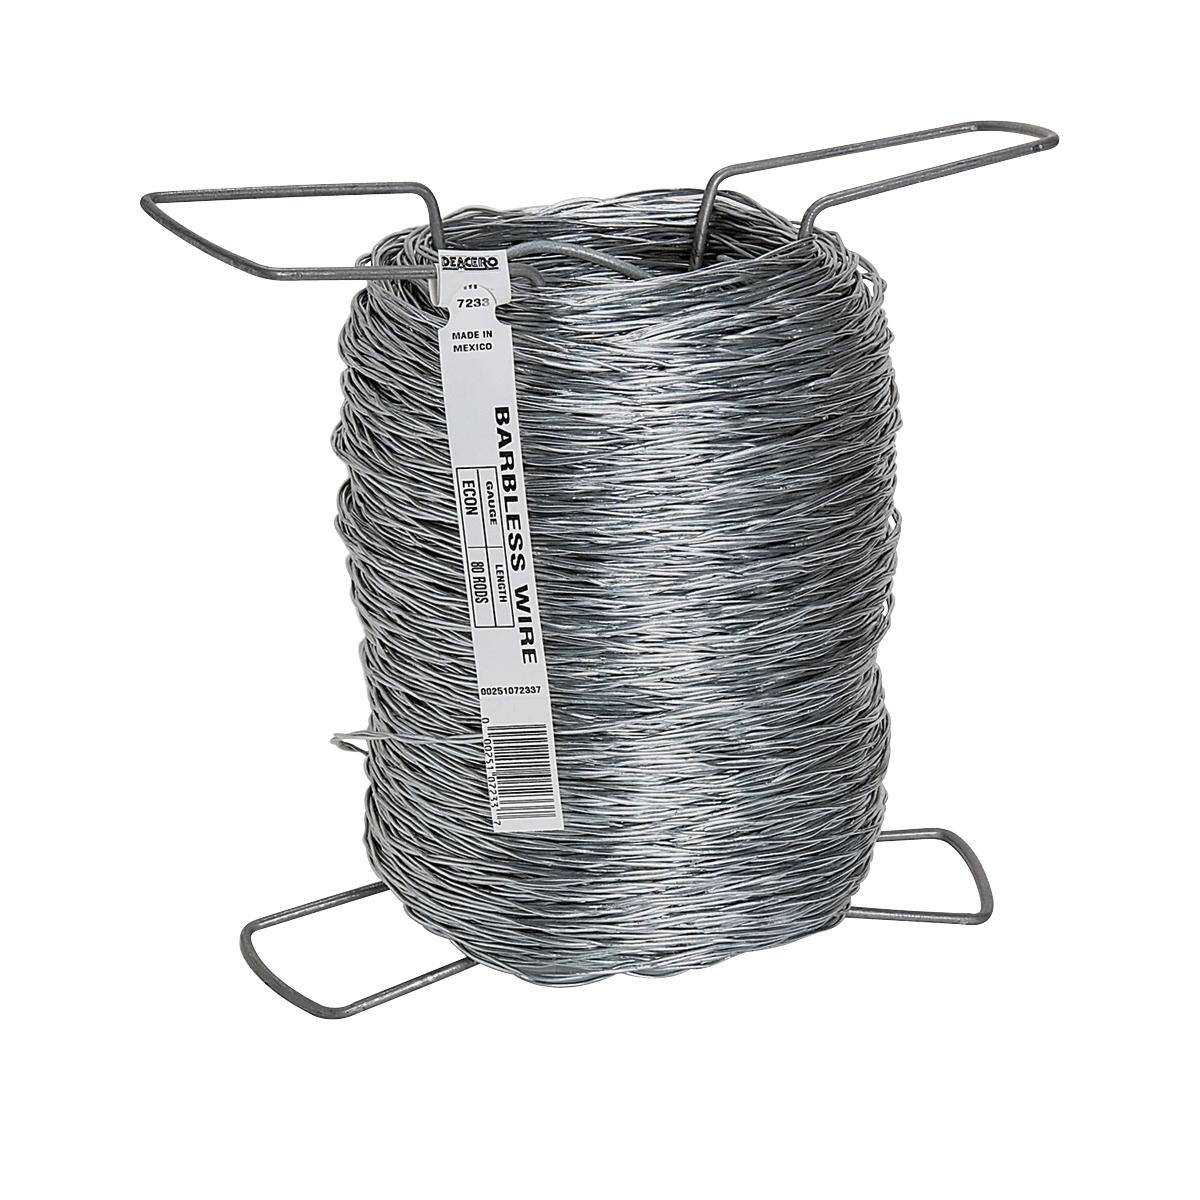 Picture of Rangemaster 7227 Barbless Wire, 1320 ft L, 12.5 ga Gauge, Zinc